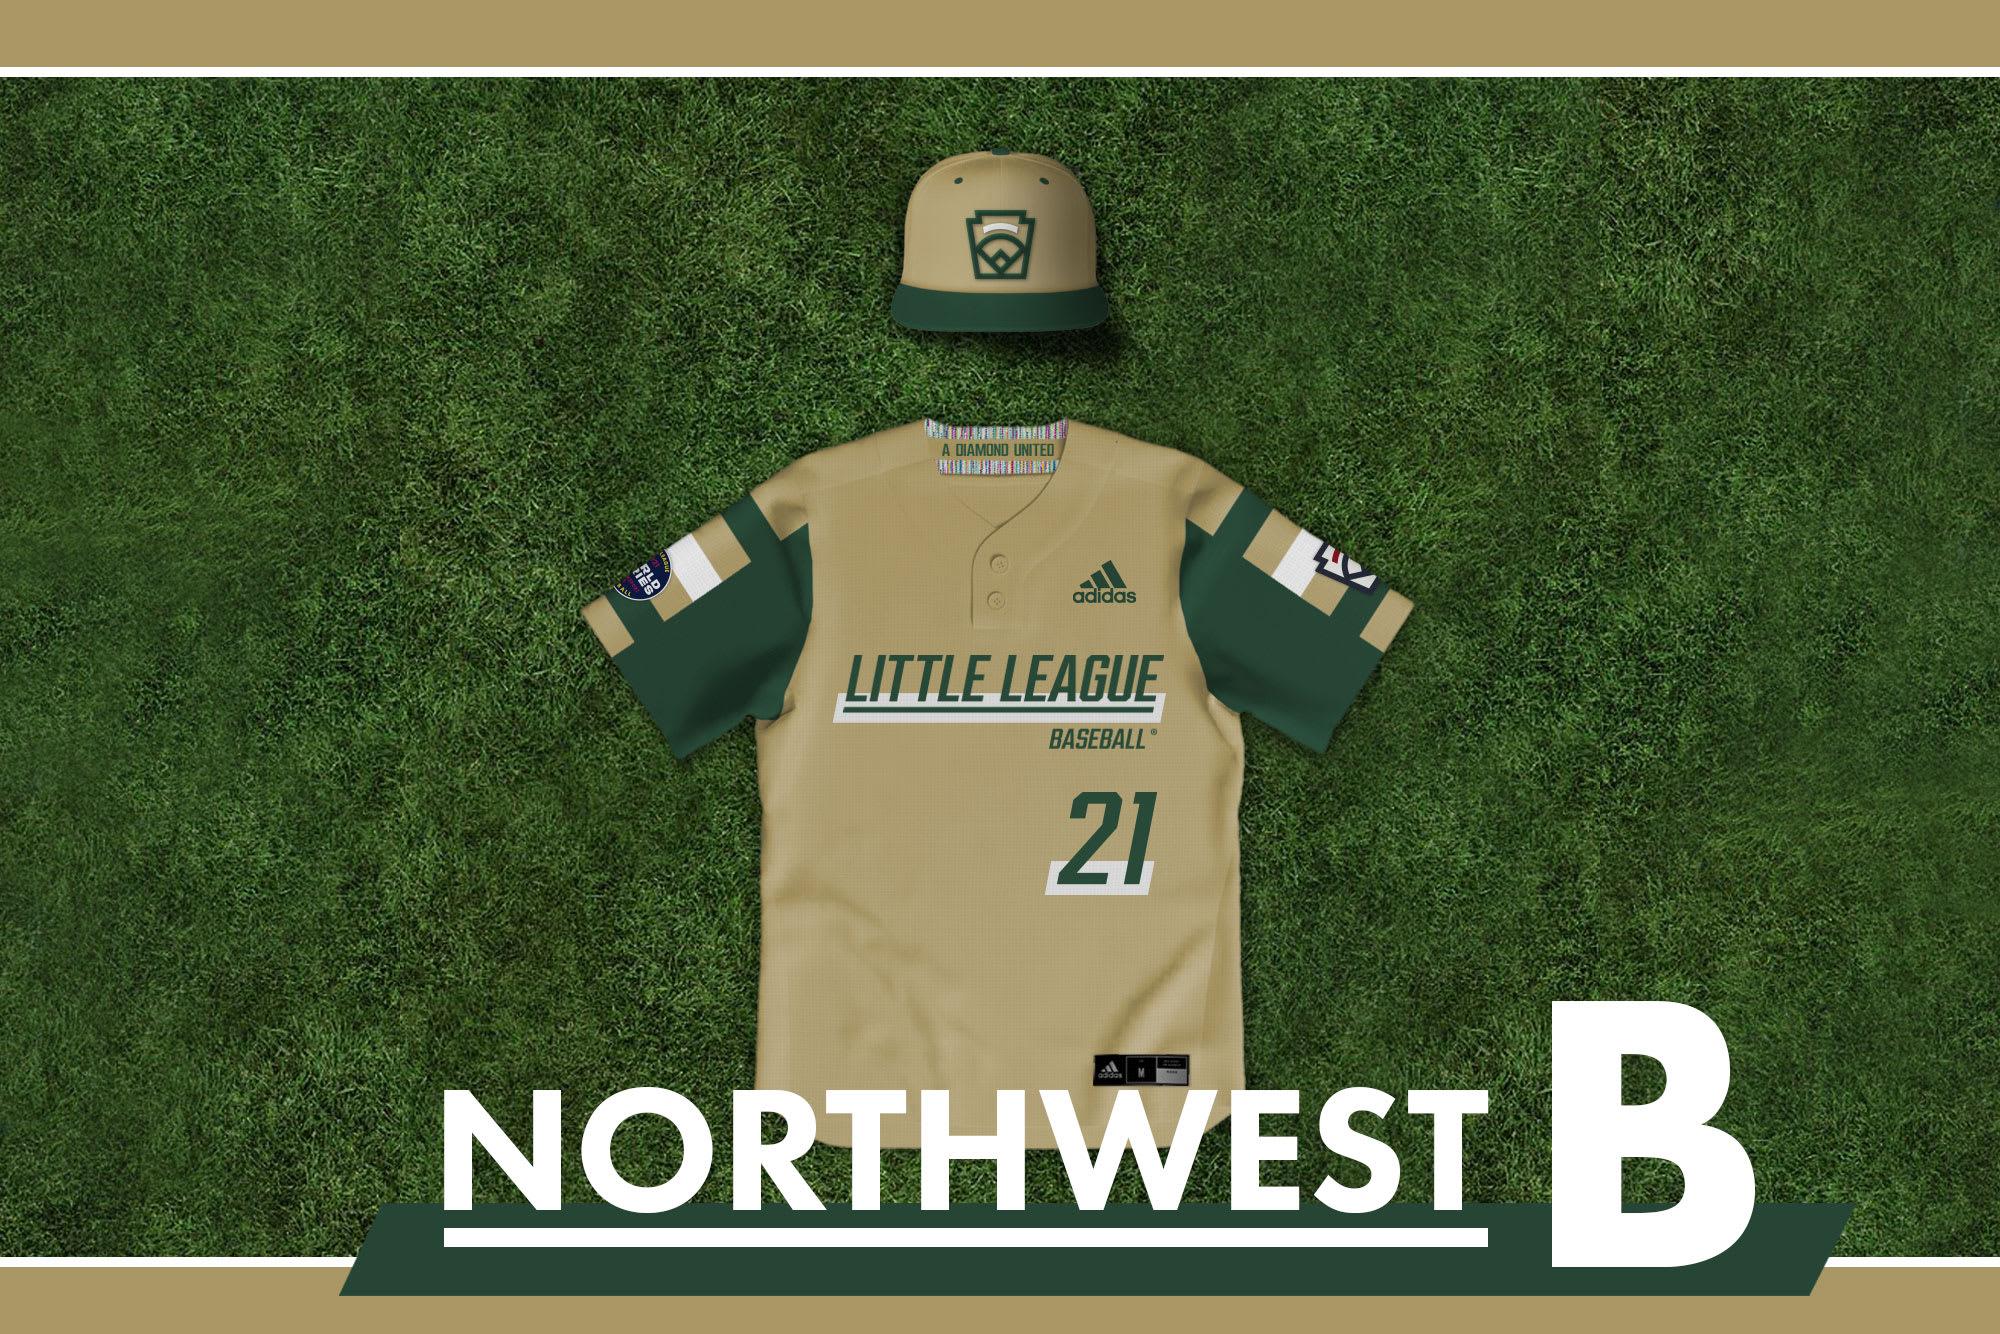 LLB Northwest B uniform